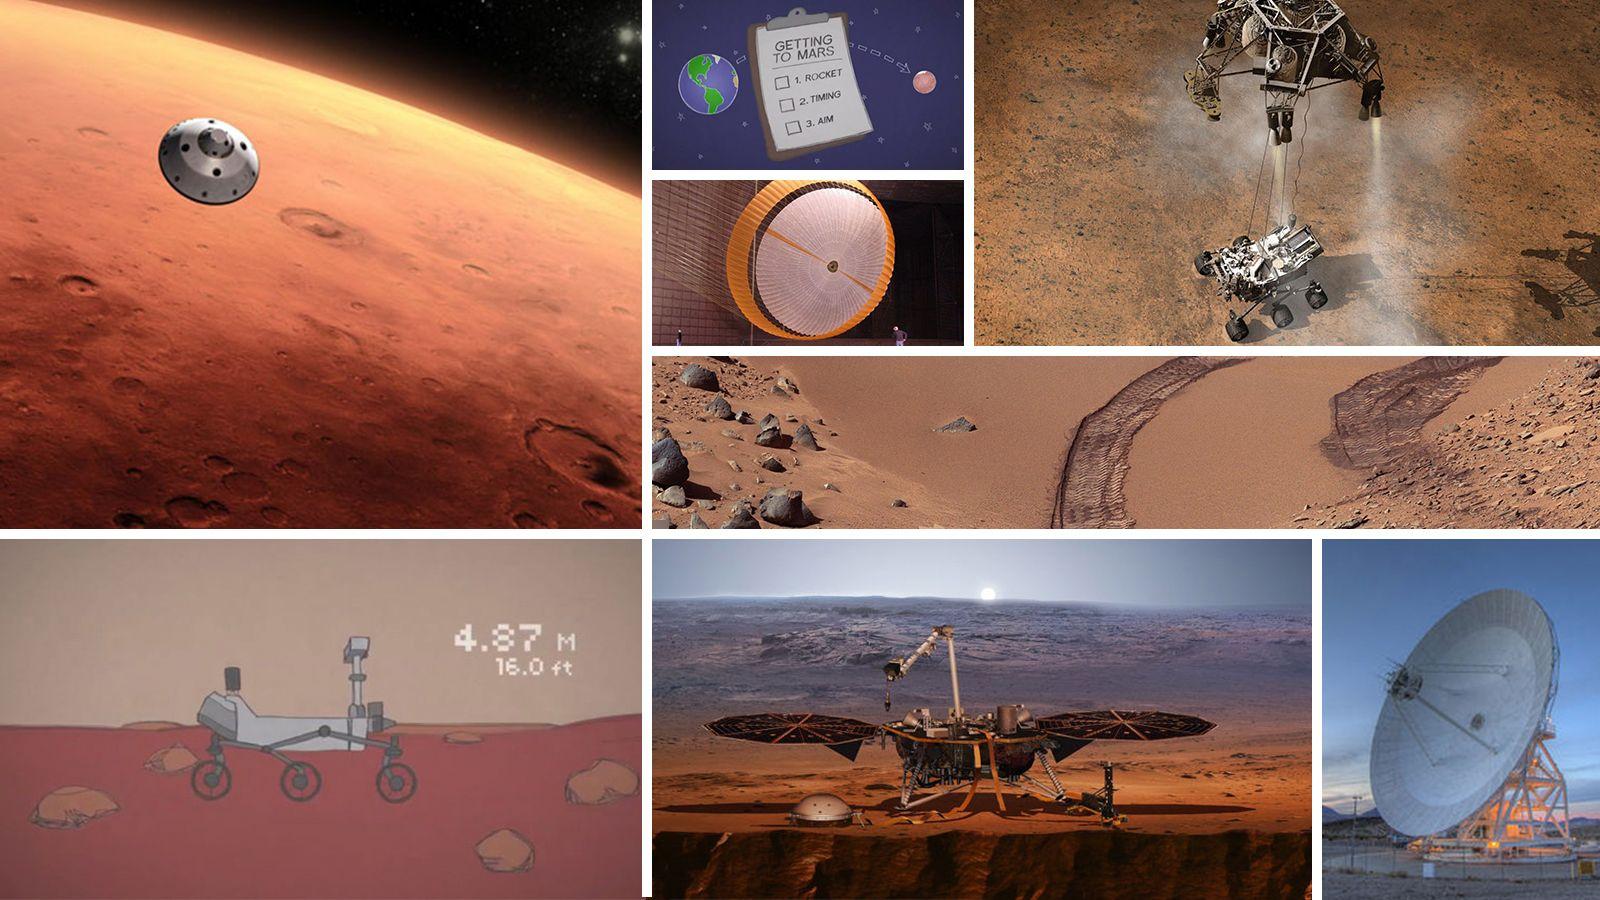 Mission To Mars Unit Activity